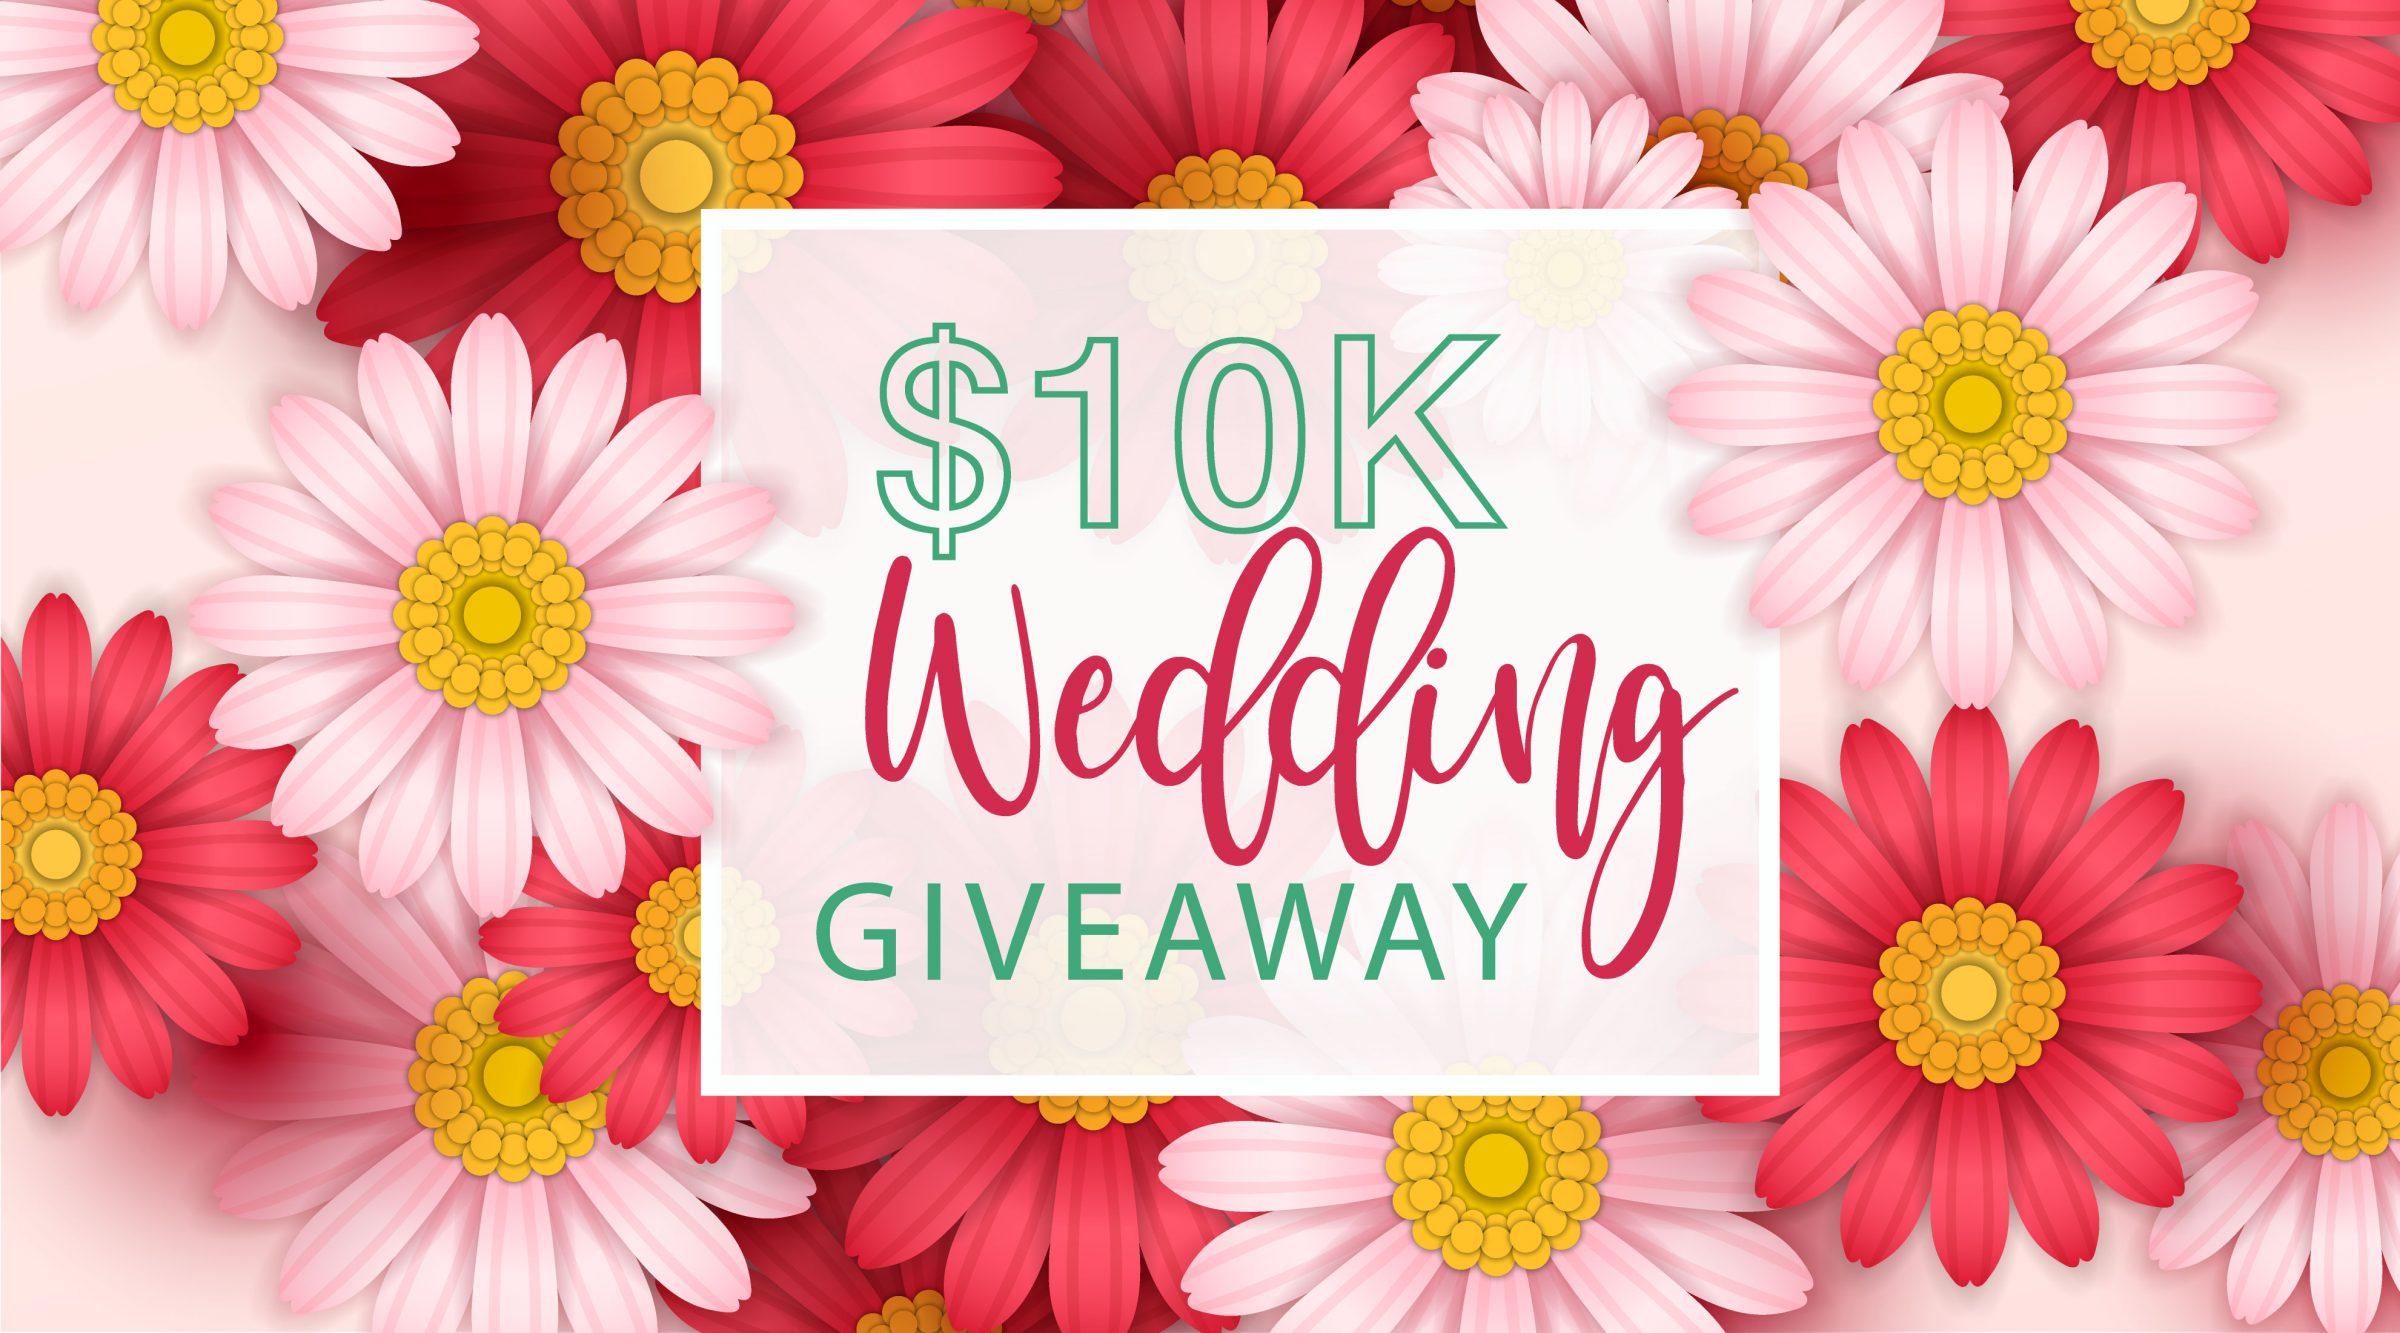 $10,000 cash wedding giveaway